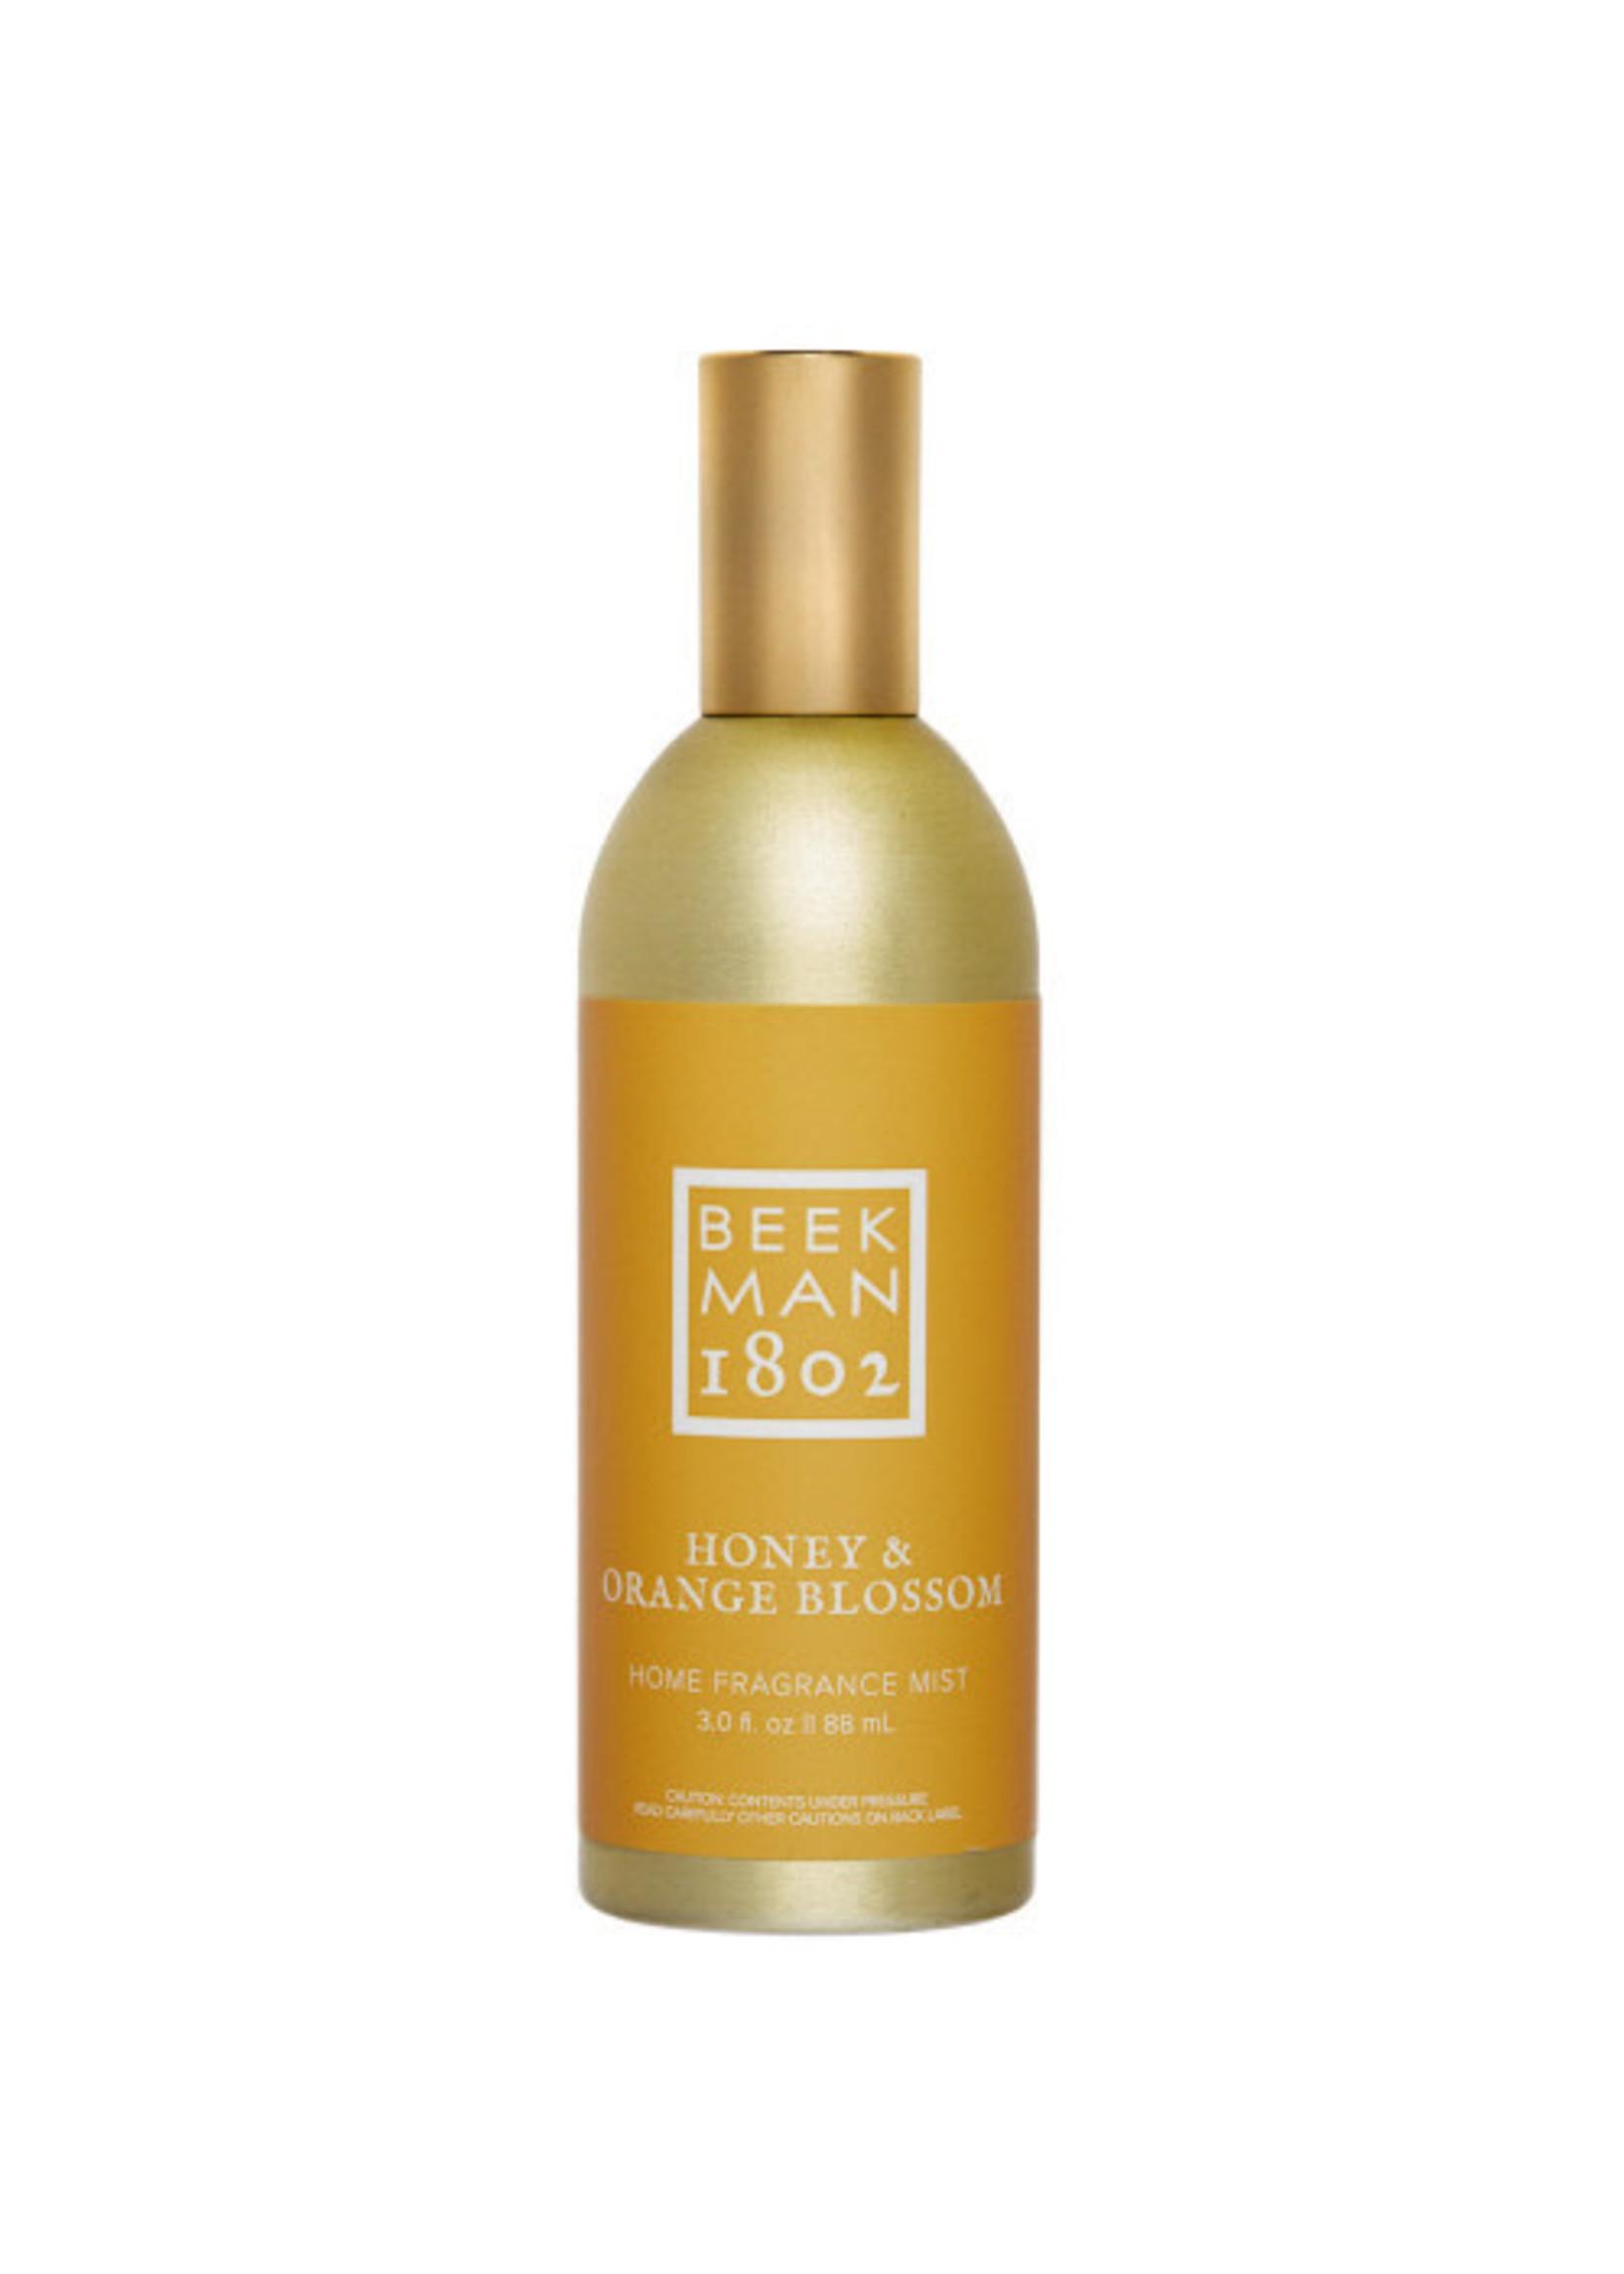 Beekman 1802 Honey & Orange Blossom Home Fragrance Mist